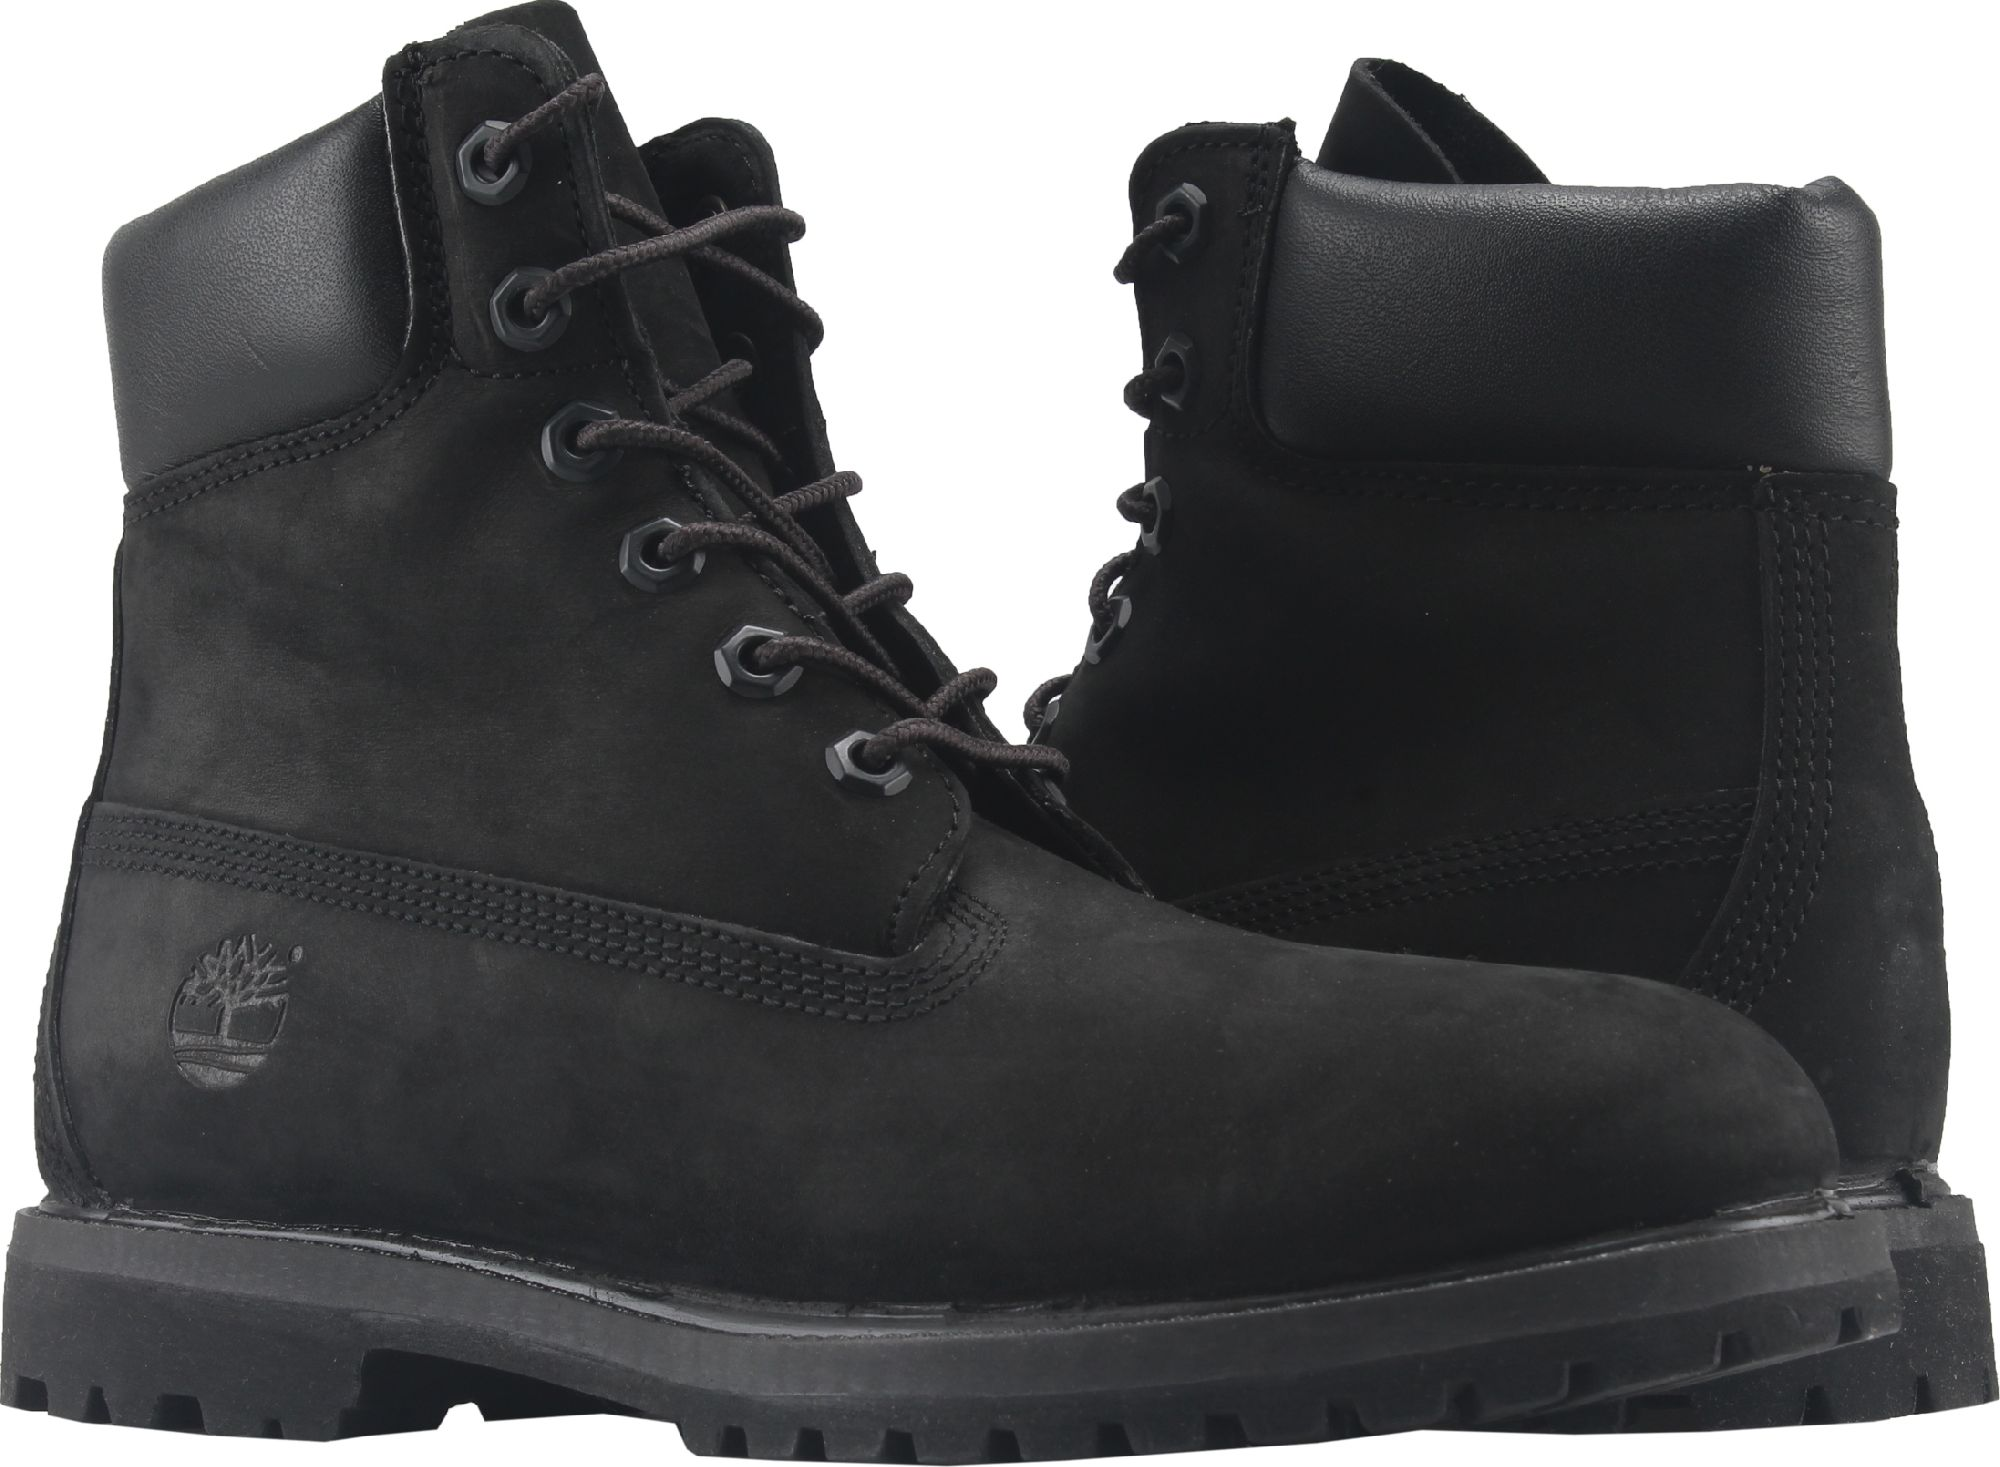 Timberland Buty damskie 6 Premium In Boot czarne r. 36 (8658A) 8658A